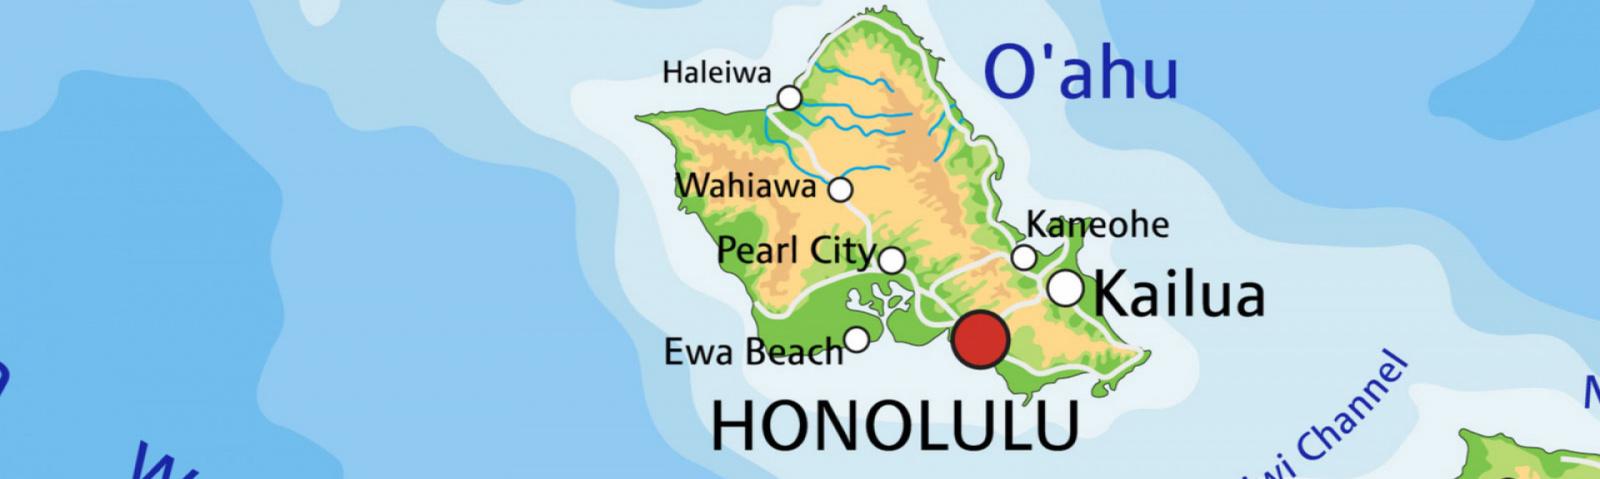 Oahu Maps